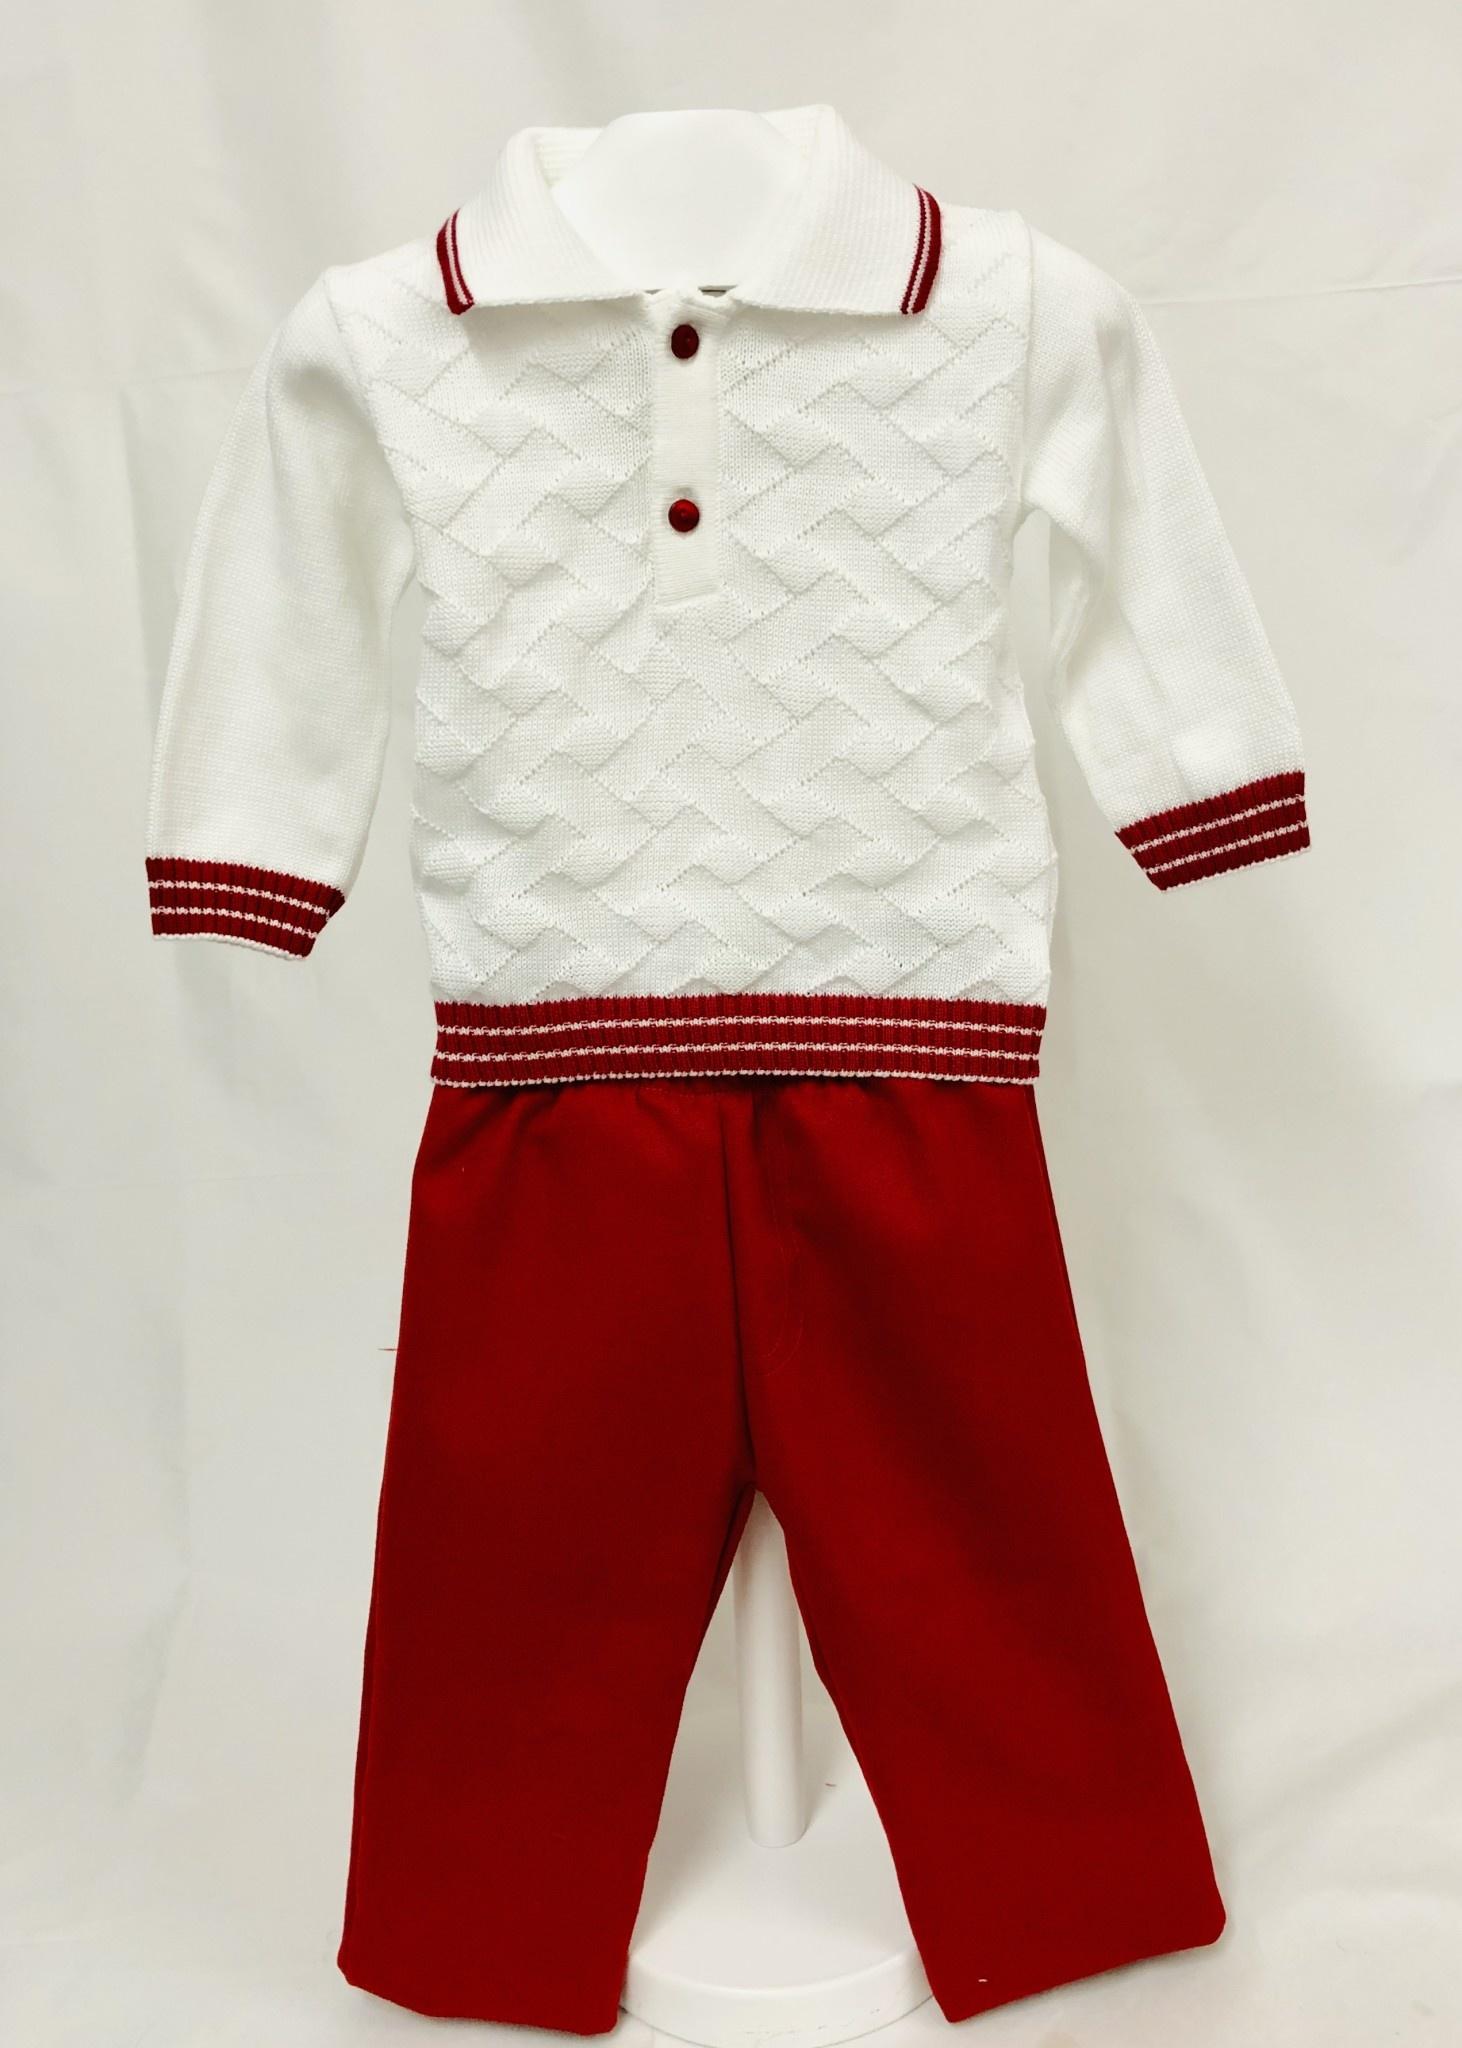 Pretty Originals Pretty Originals JPL8187 Red/White Knit Top &Trousers